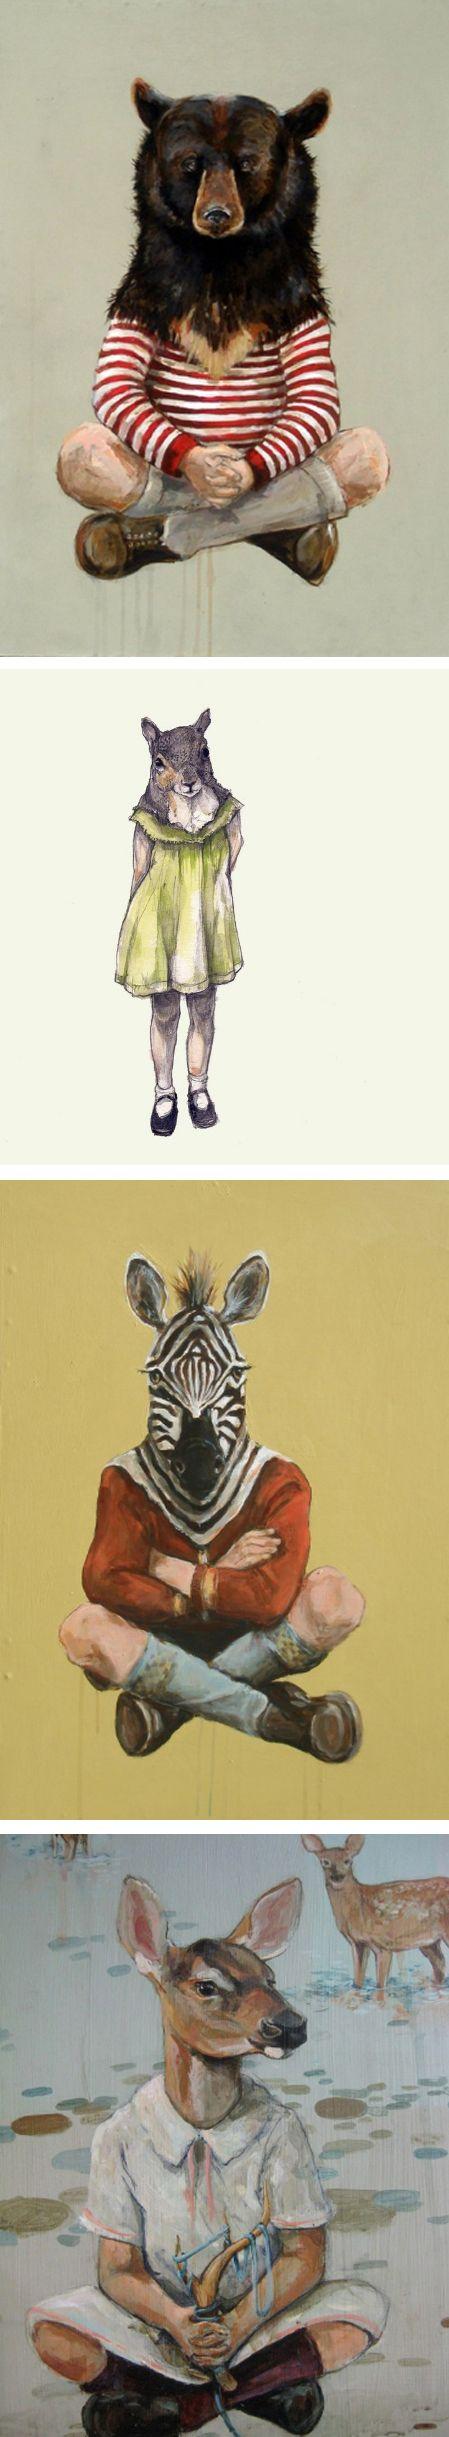 michael mcconnell: Animal Children, Children Portraits, Animal Head, Child Portraits, Animals In Art, Animal Face, Animals People